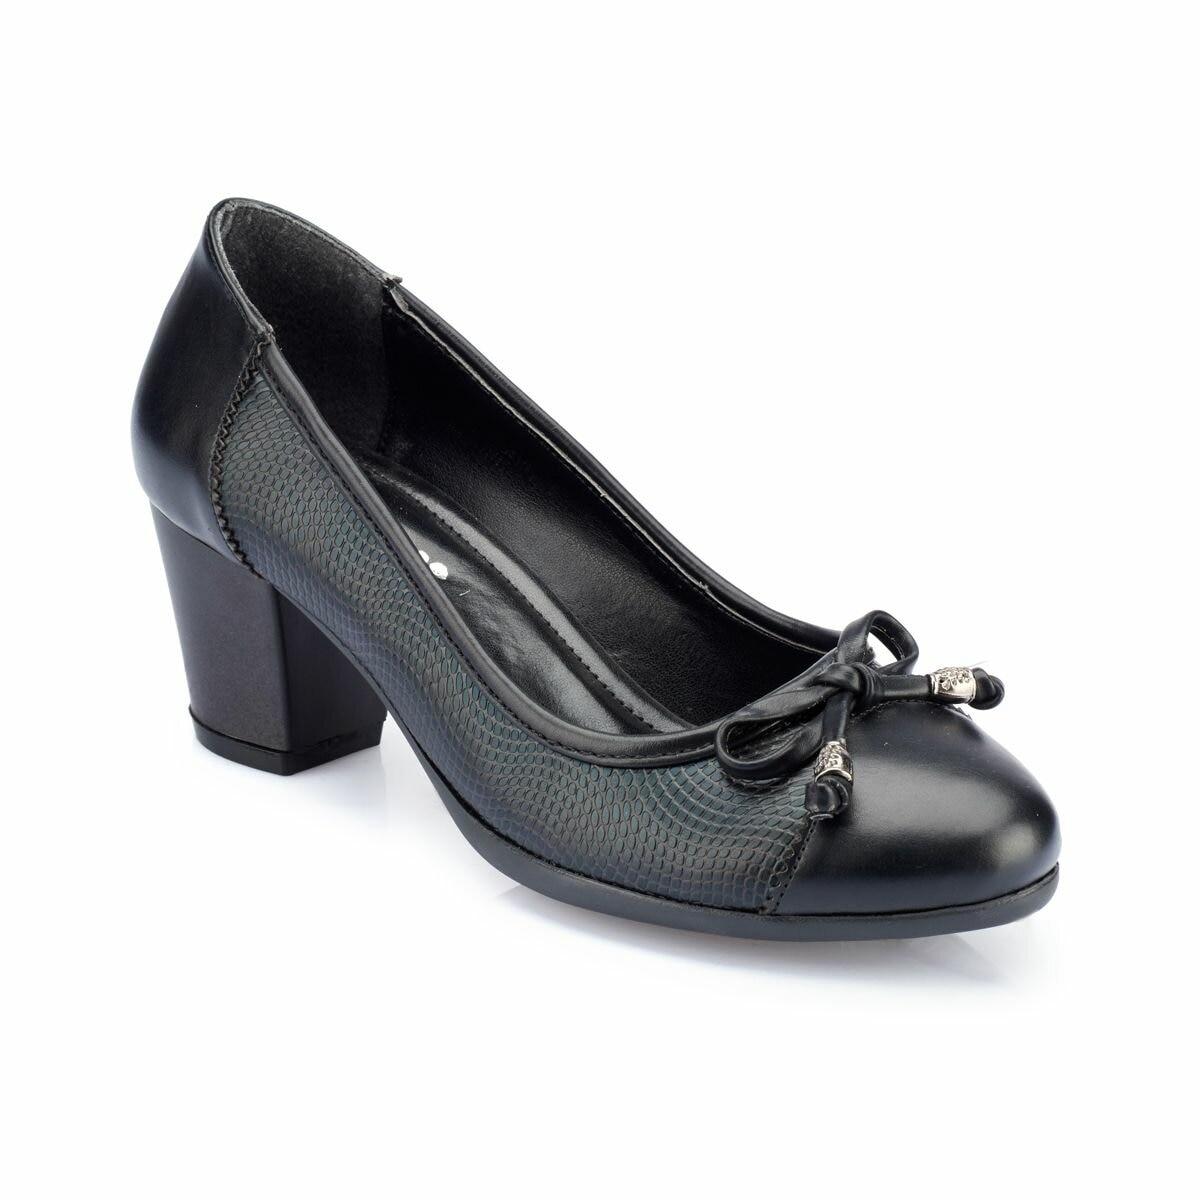 FLO Women Shoes Black Fashion Low Heeled Casual Classic Dress Women Female Footwear Shoes Женская обувь 82.312088.Z Polaris